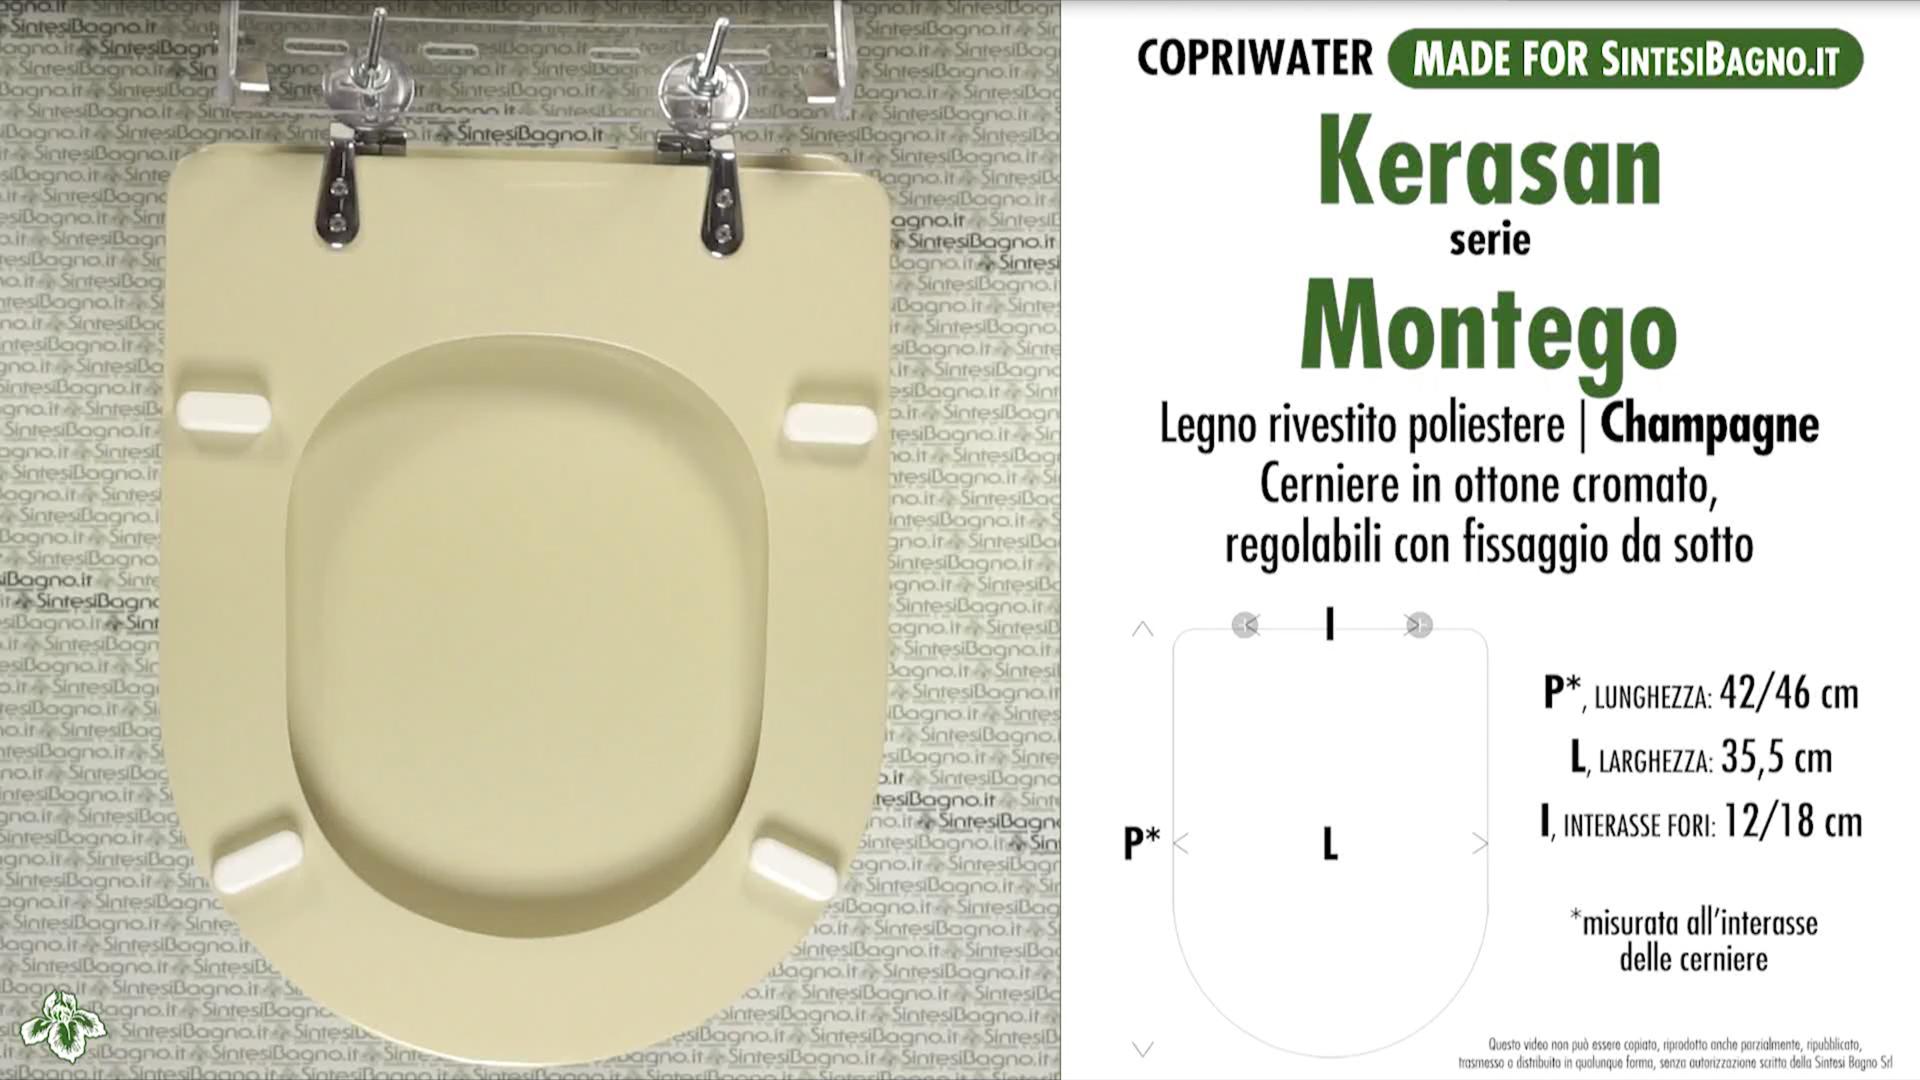 Schede tecniche Kerasan Montego